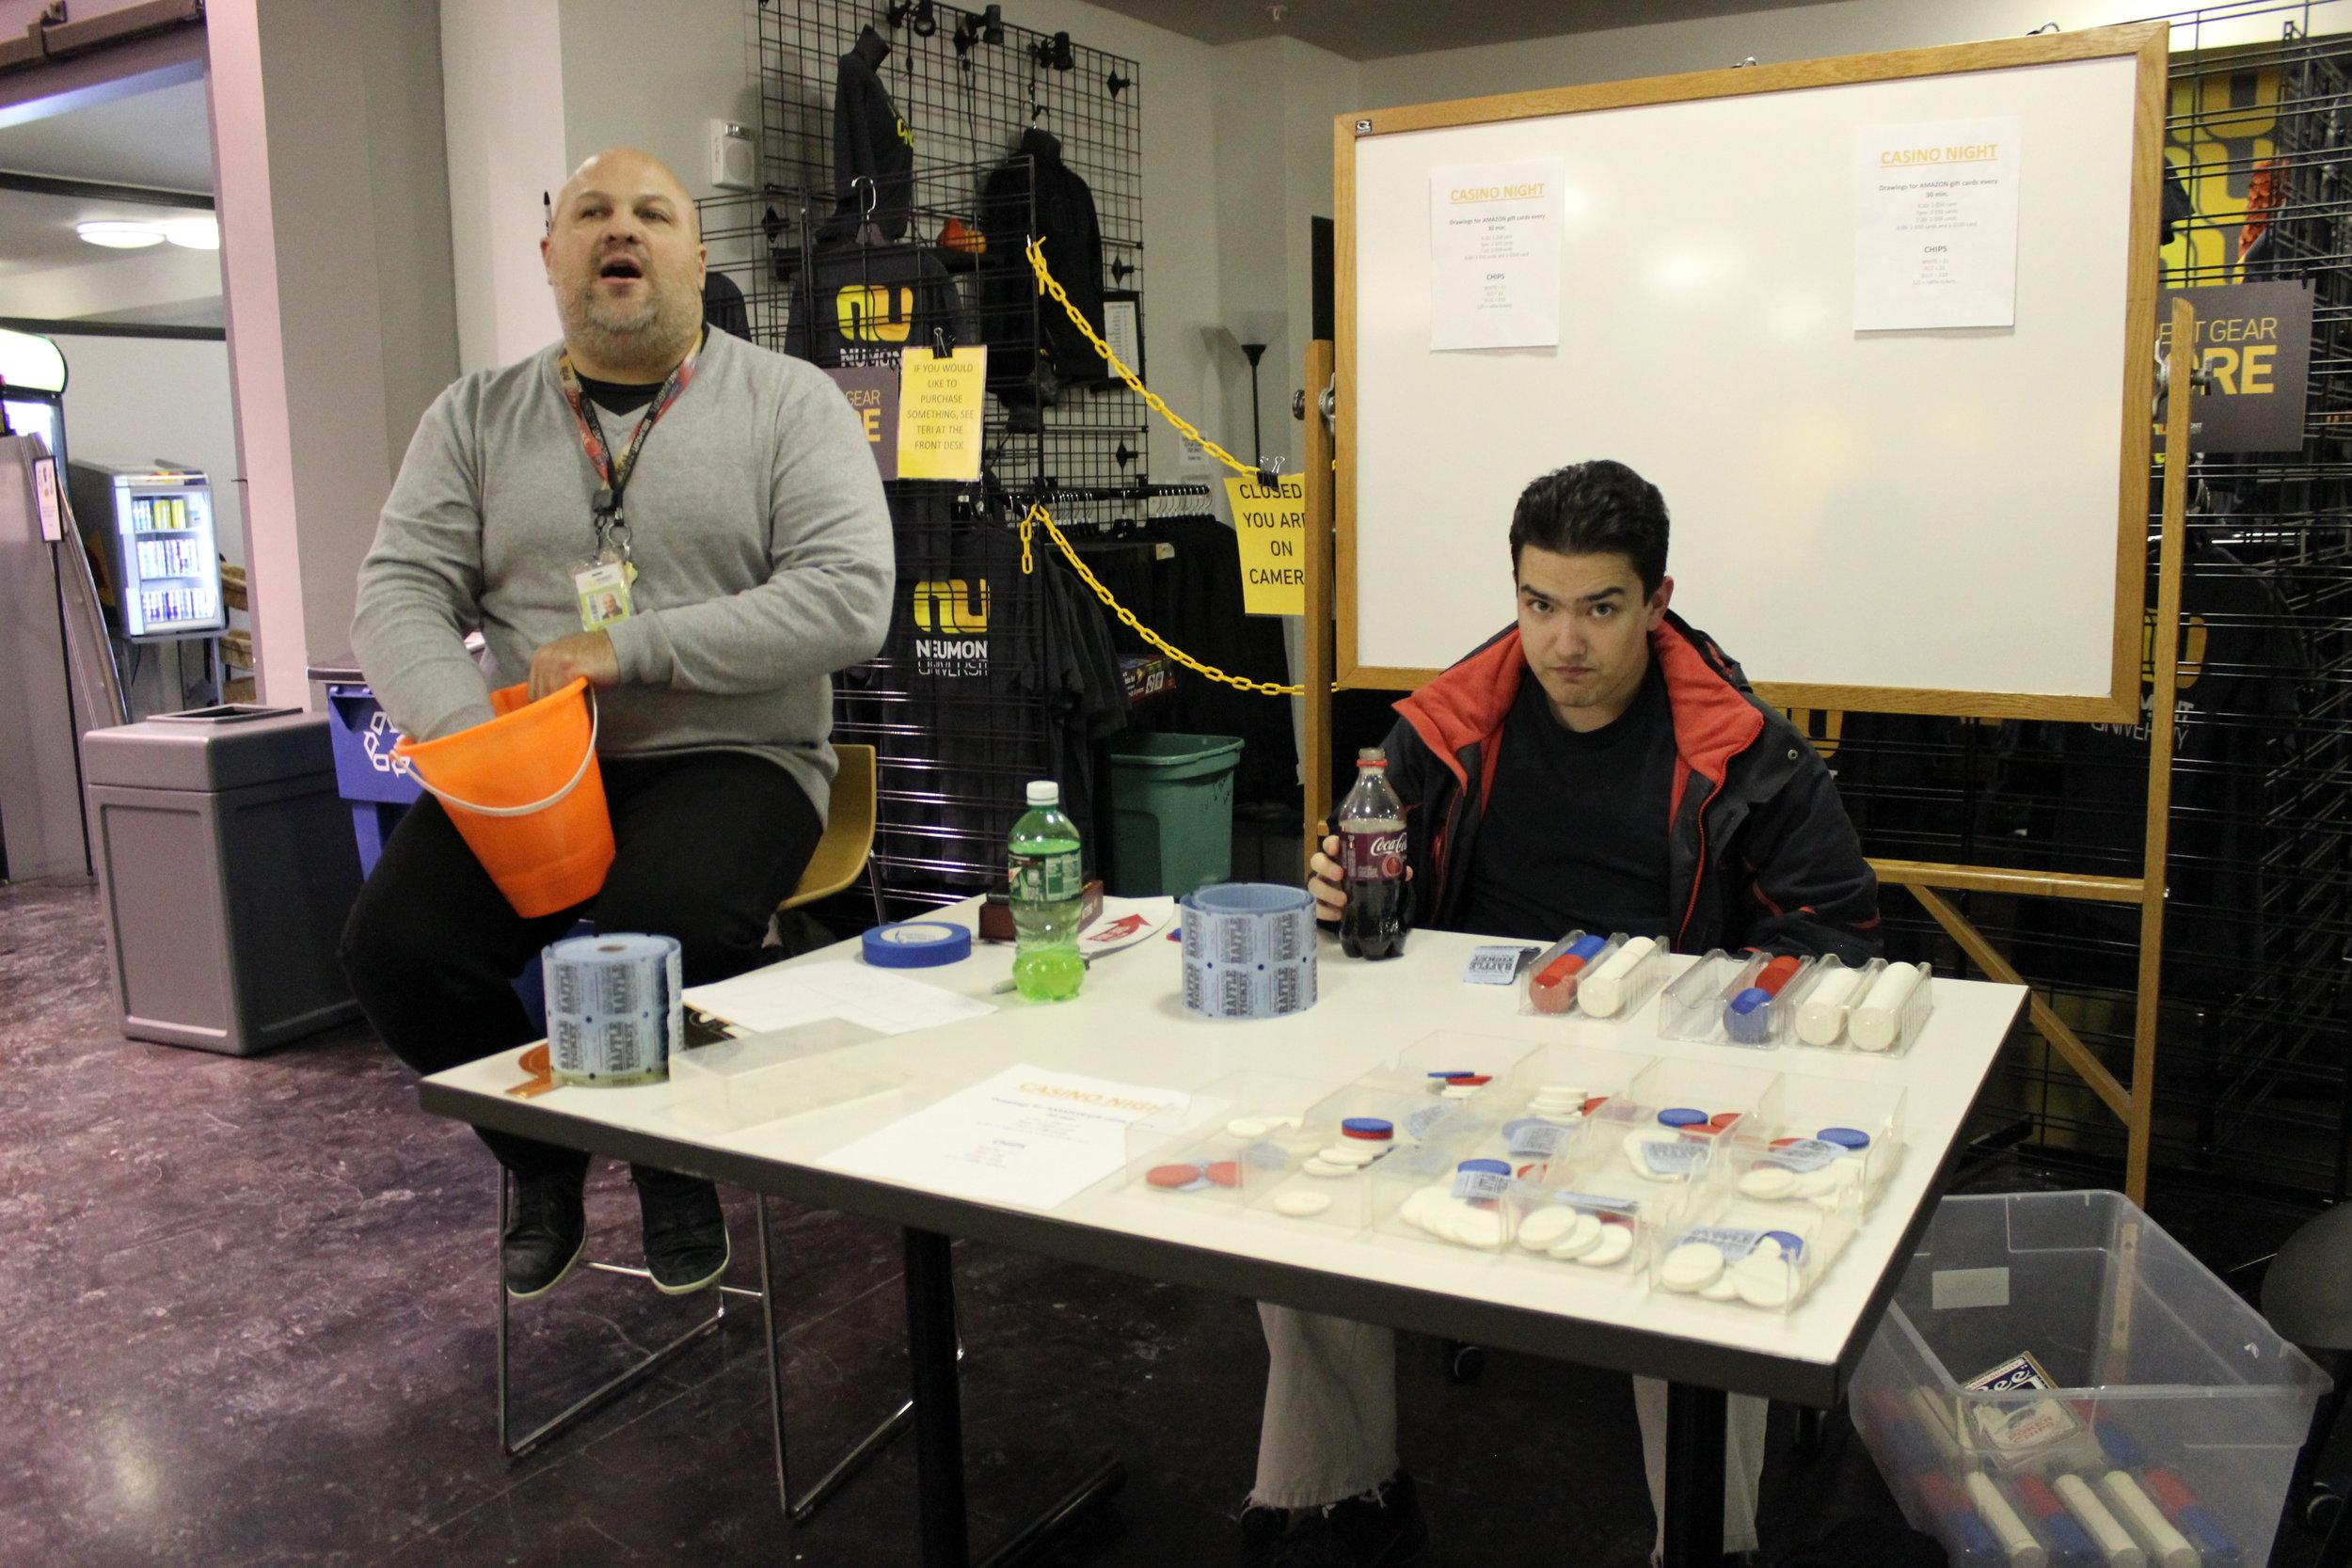 Senior Student Life Coordinator John Peppinger draws the winners during a raffle at Casino Night.